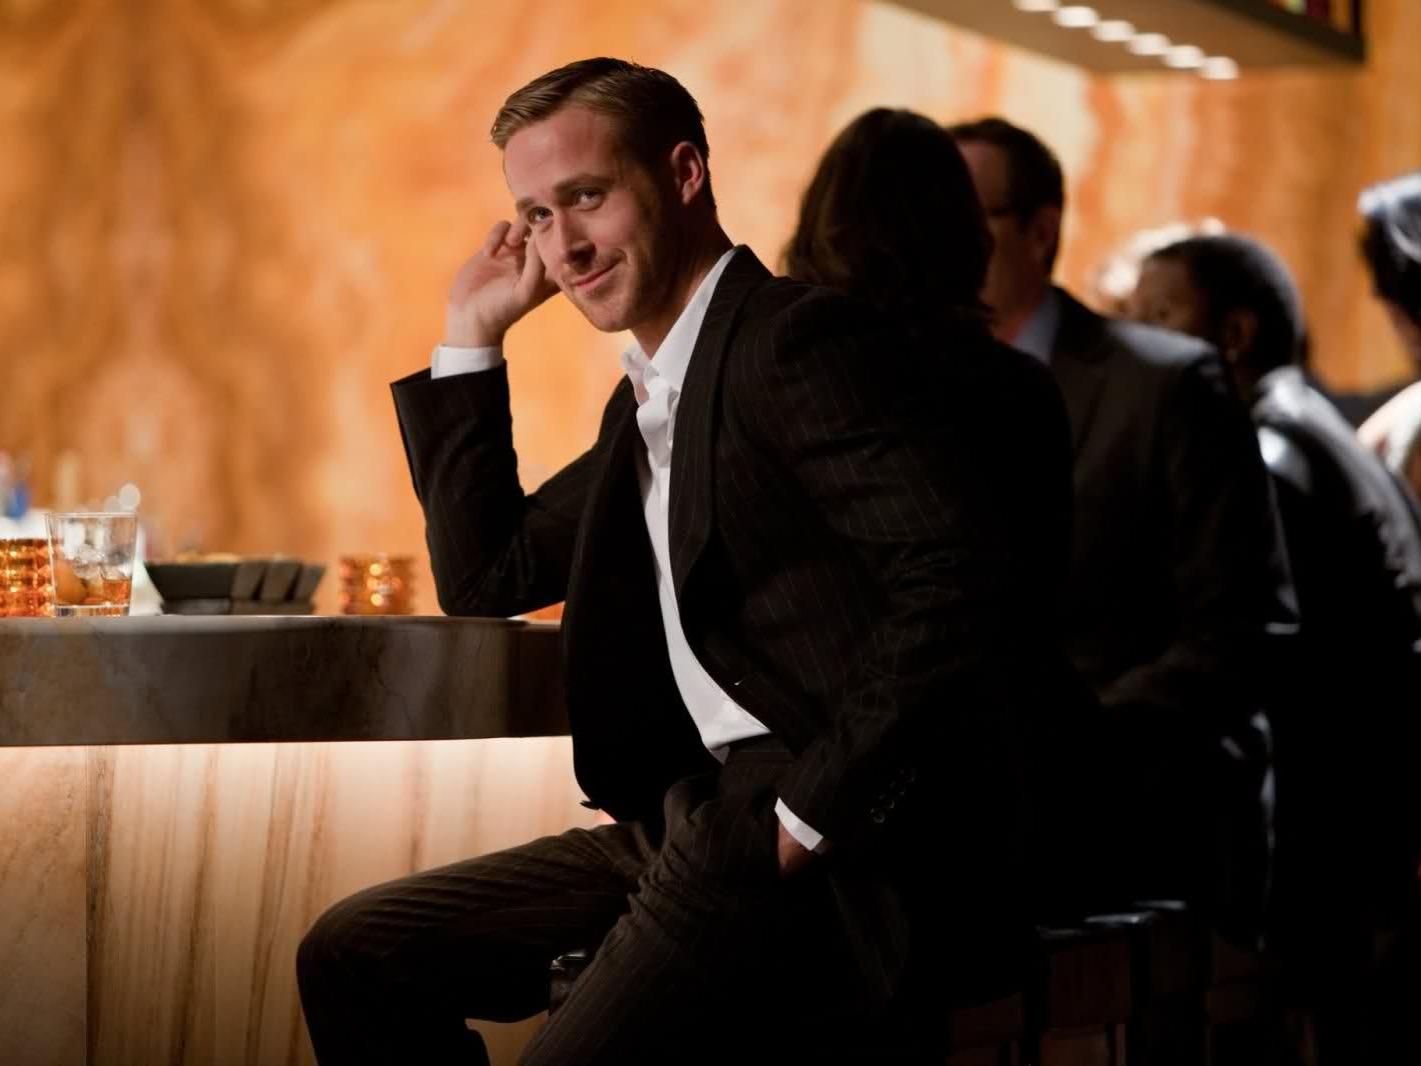 Ryan Gosling, The Notebook, Blue Valentine, La La Land